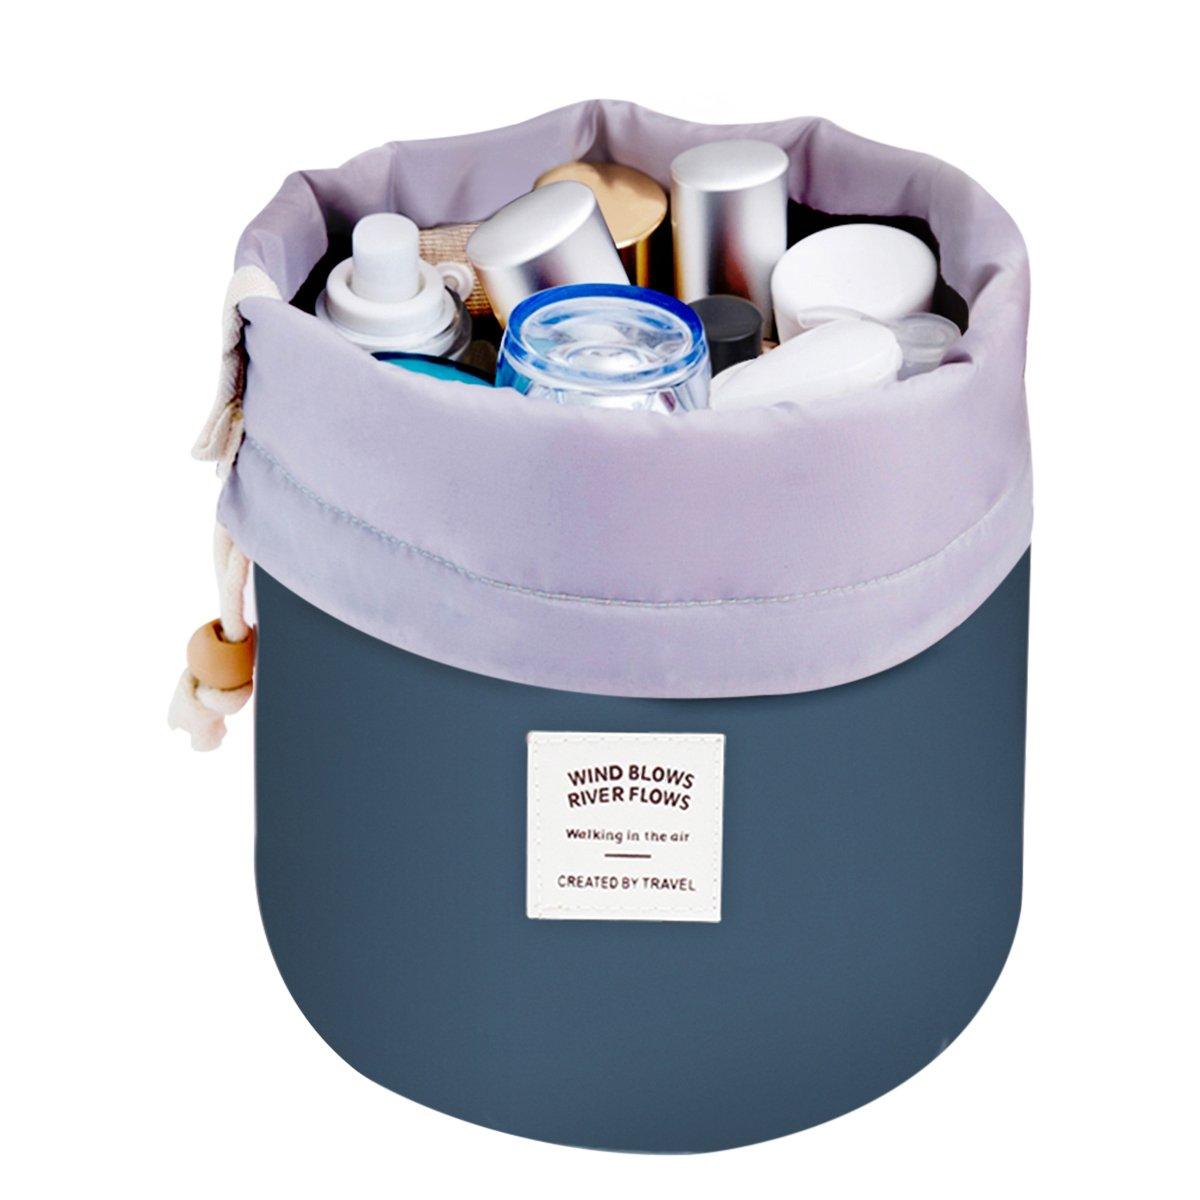 62d3583600df Mermaid Toiletry Bag Travel Makeup Bag Men Women Hanging Wash Bags Large  Capacity Drawstring Cosmetic Make up Bag Blue + Mini Pouch + Clear PVC  Brush Bag ...